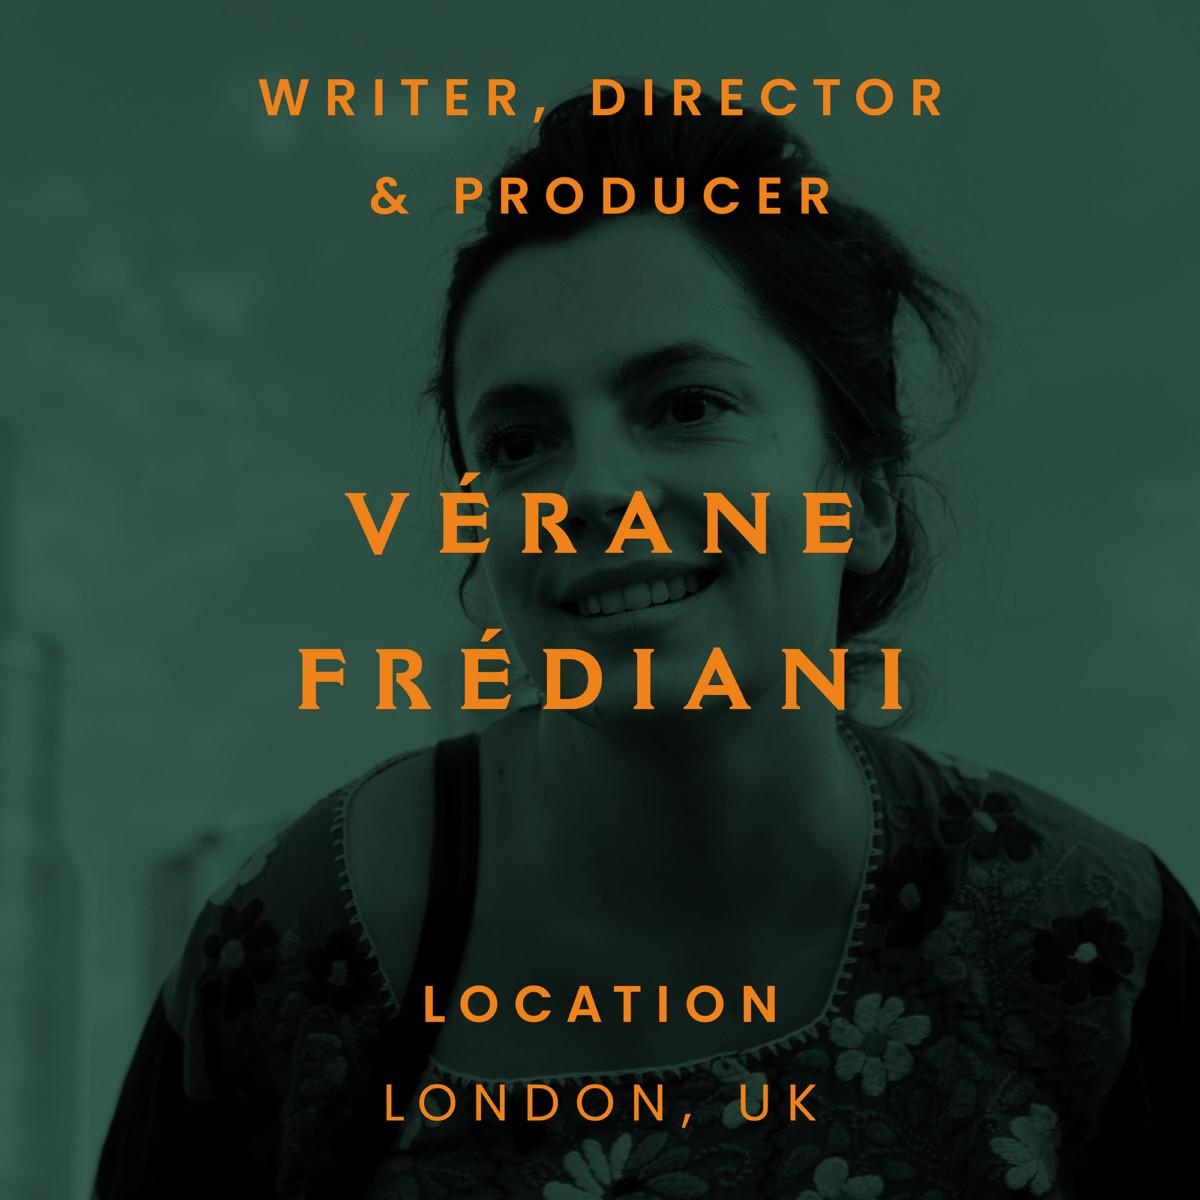 verane frediani, London, writer, director, producer